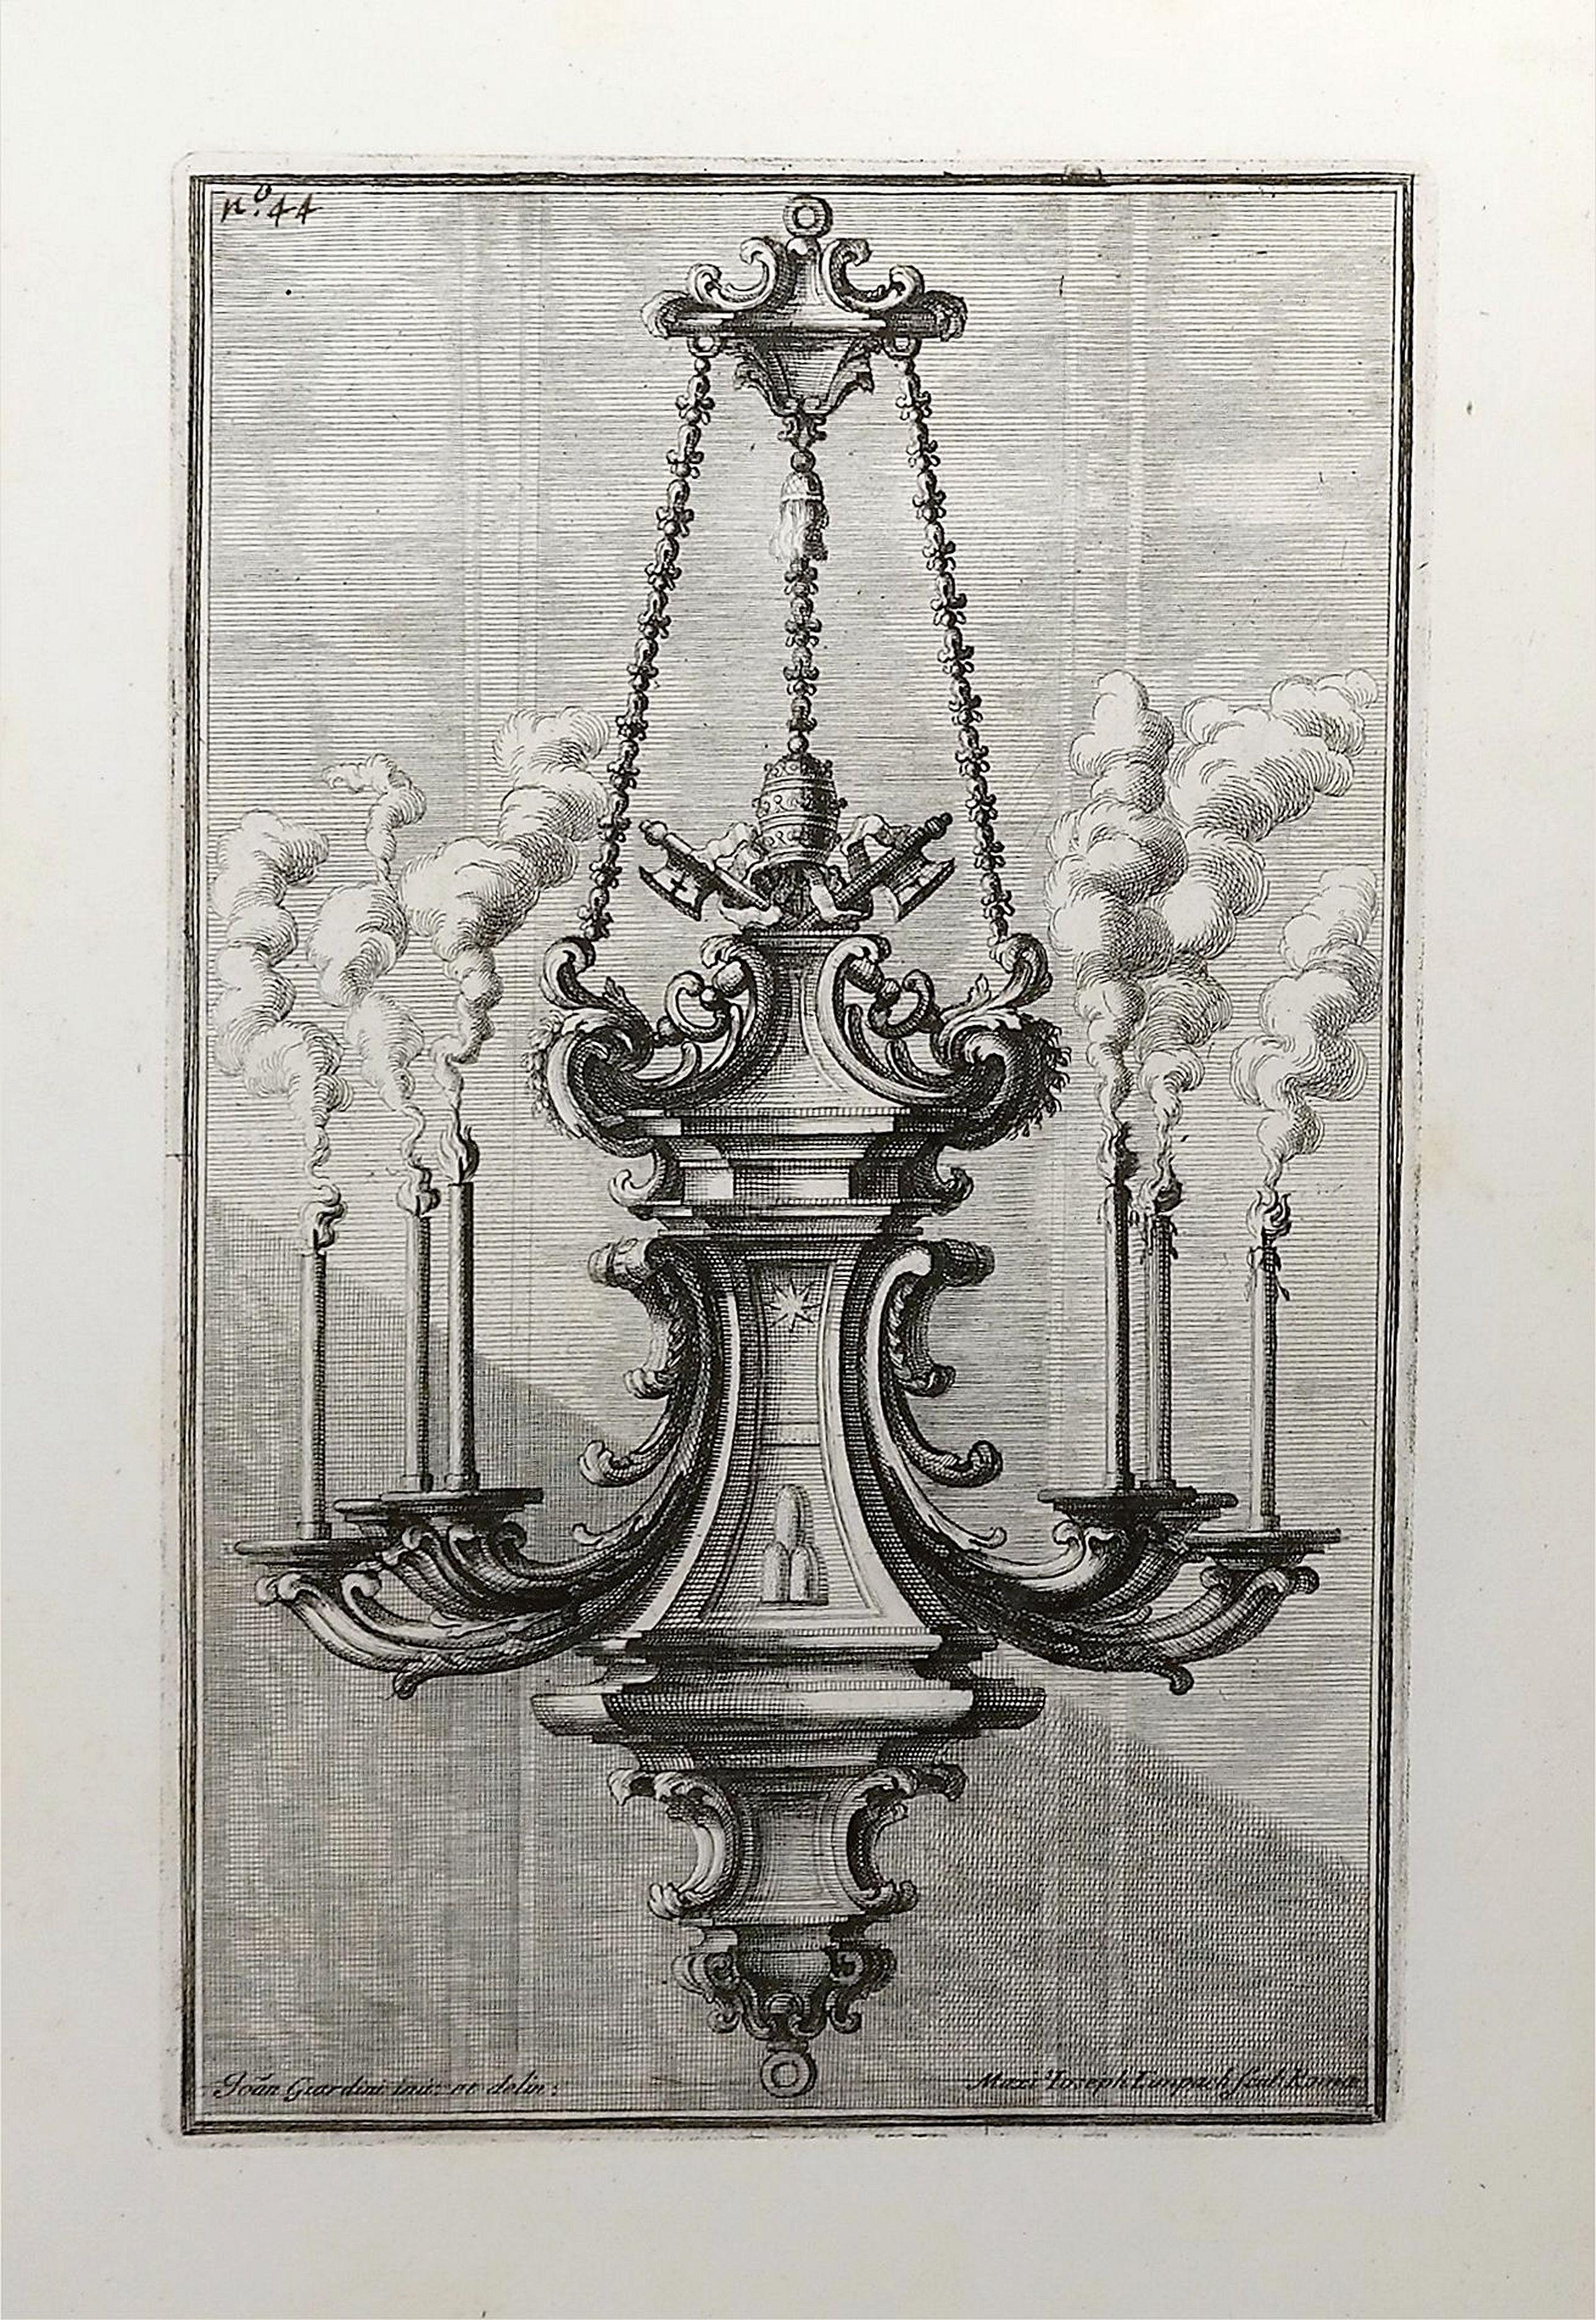 GIARDINI, G. - [Design Art] Italian Chandelier No. 44